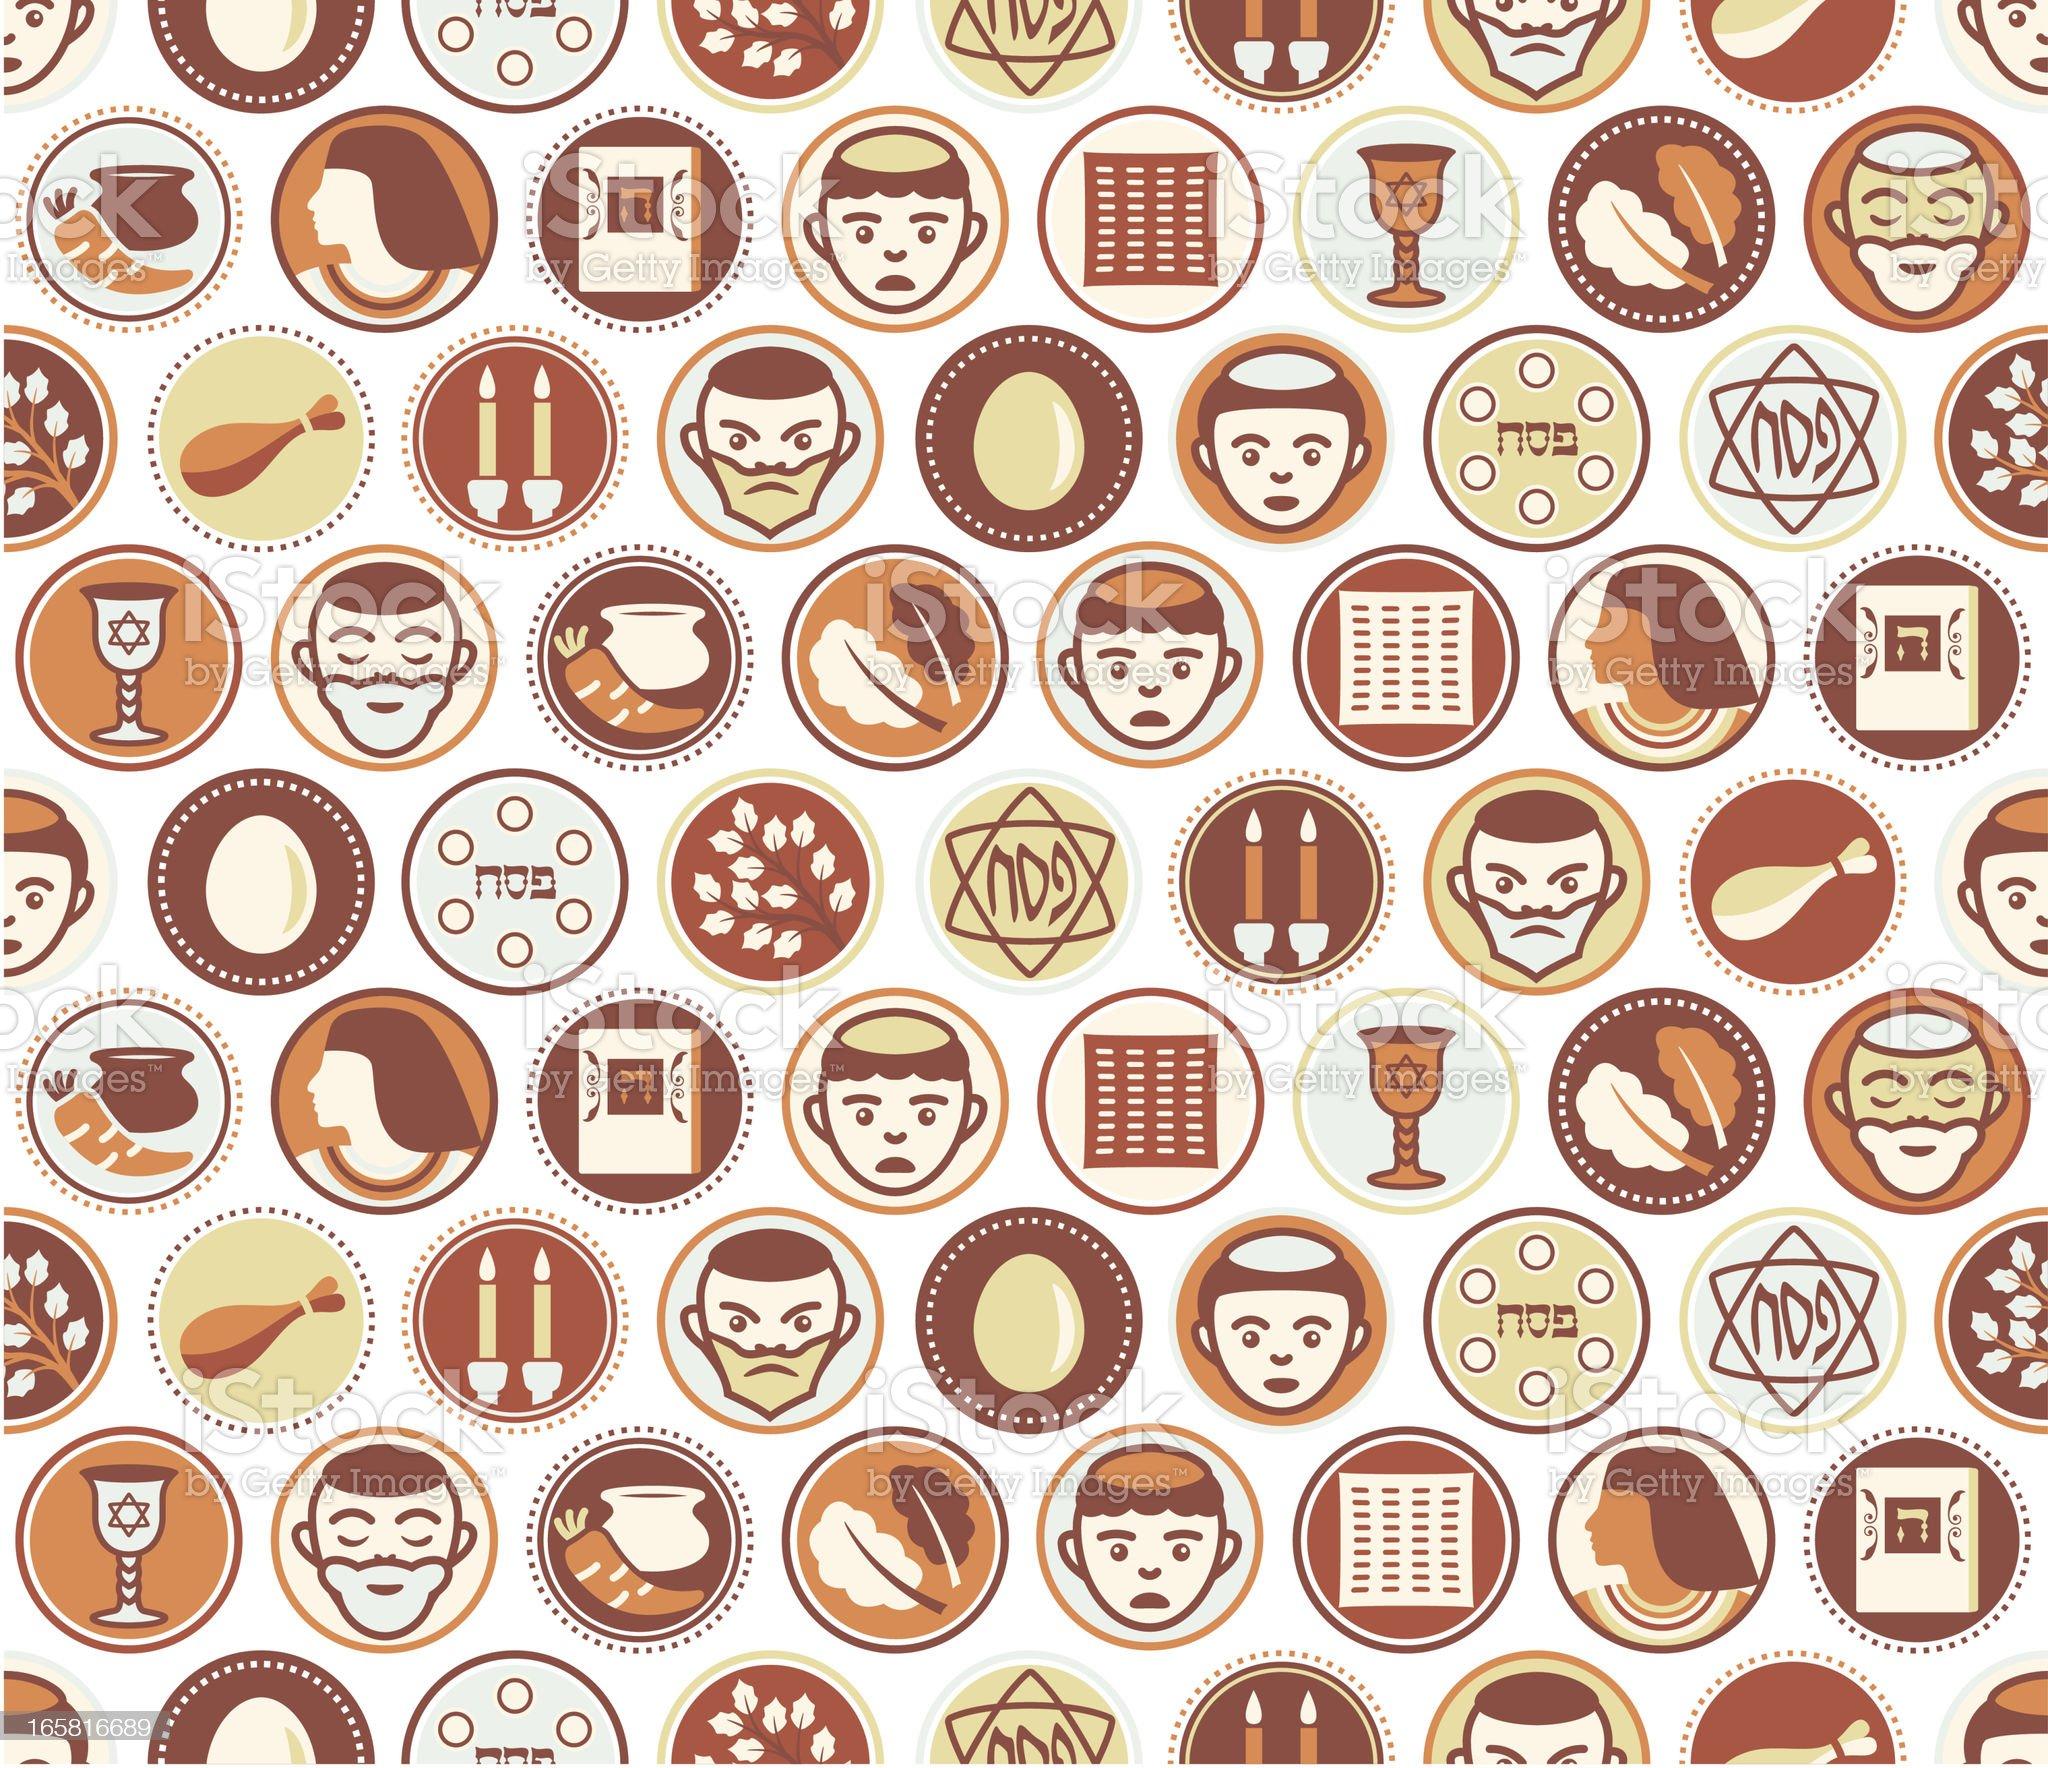 Passover Circles Seamless Pattern royalty-free stock vector art